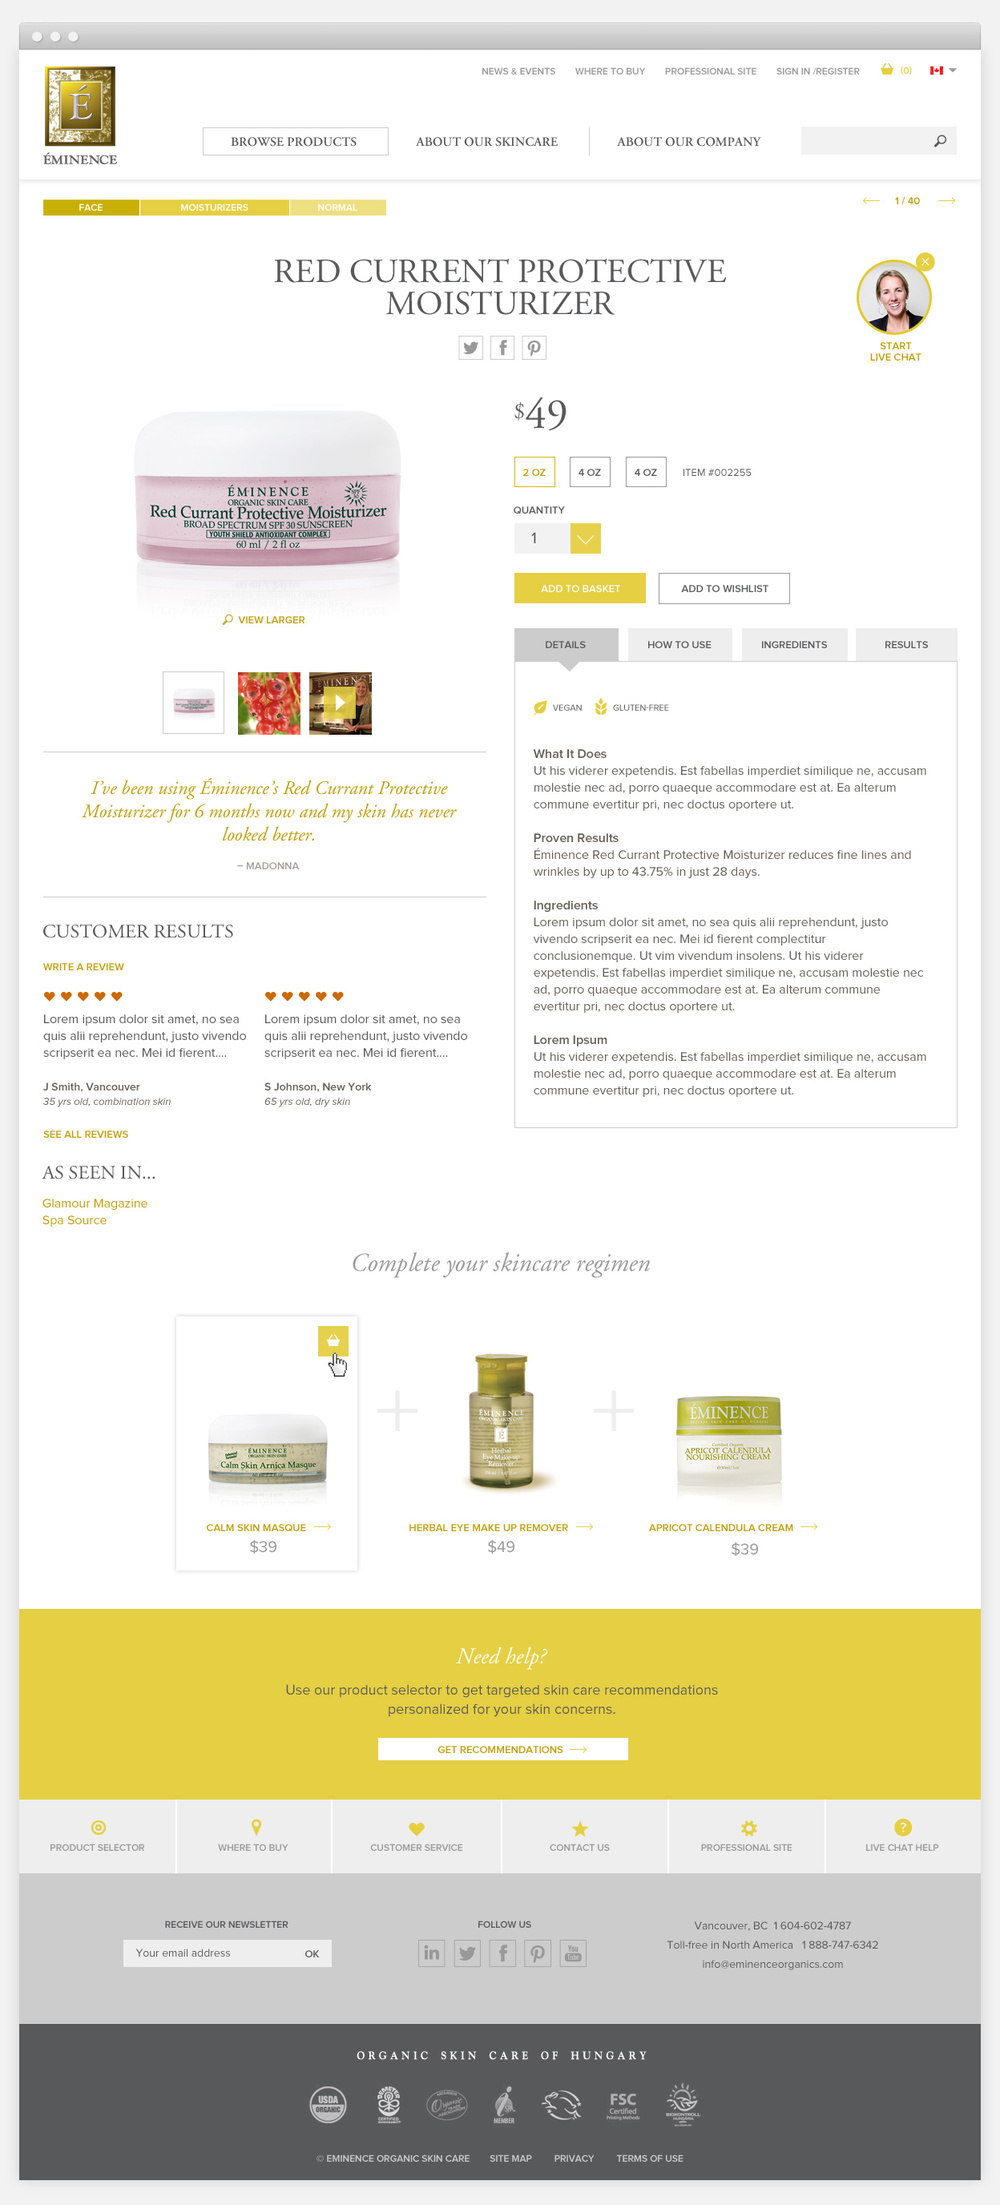 Eminence-Product.jpg